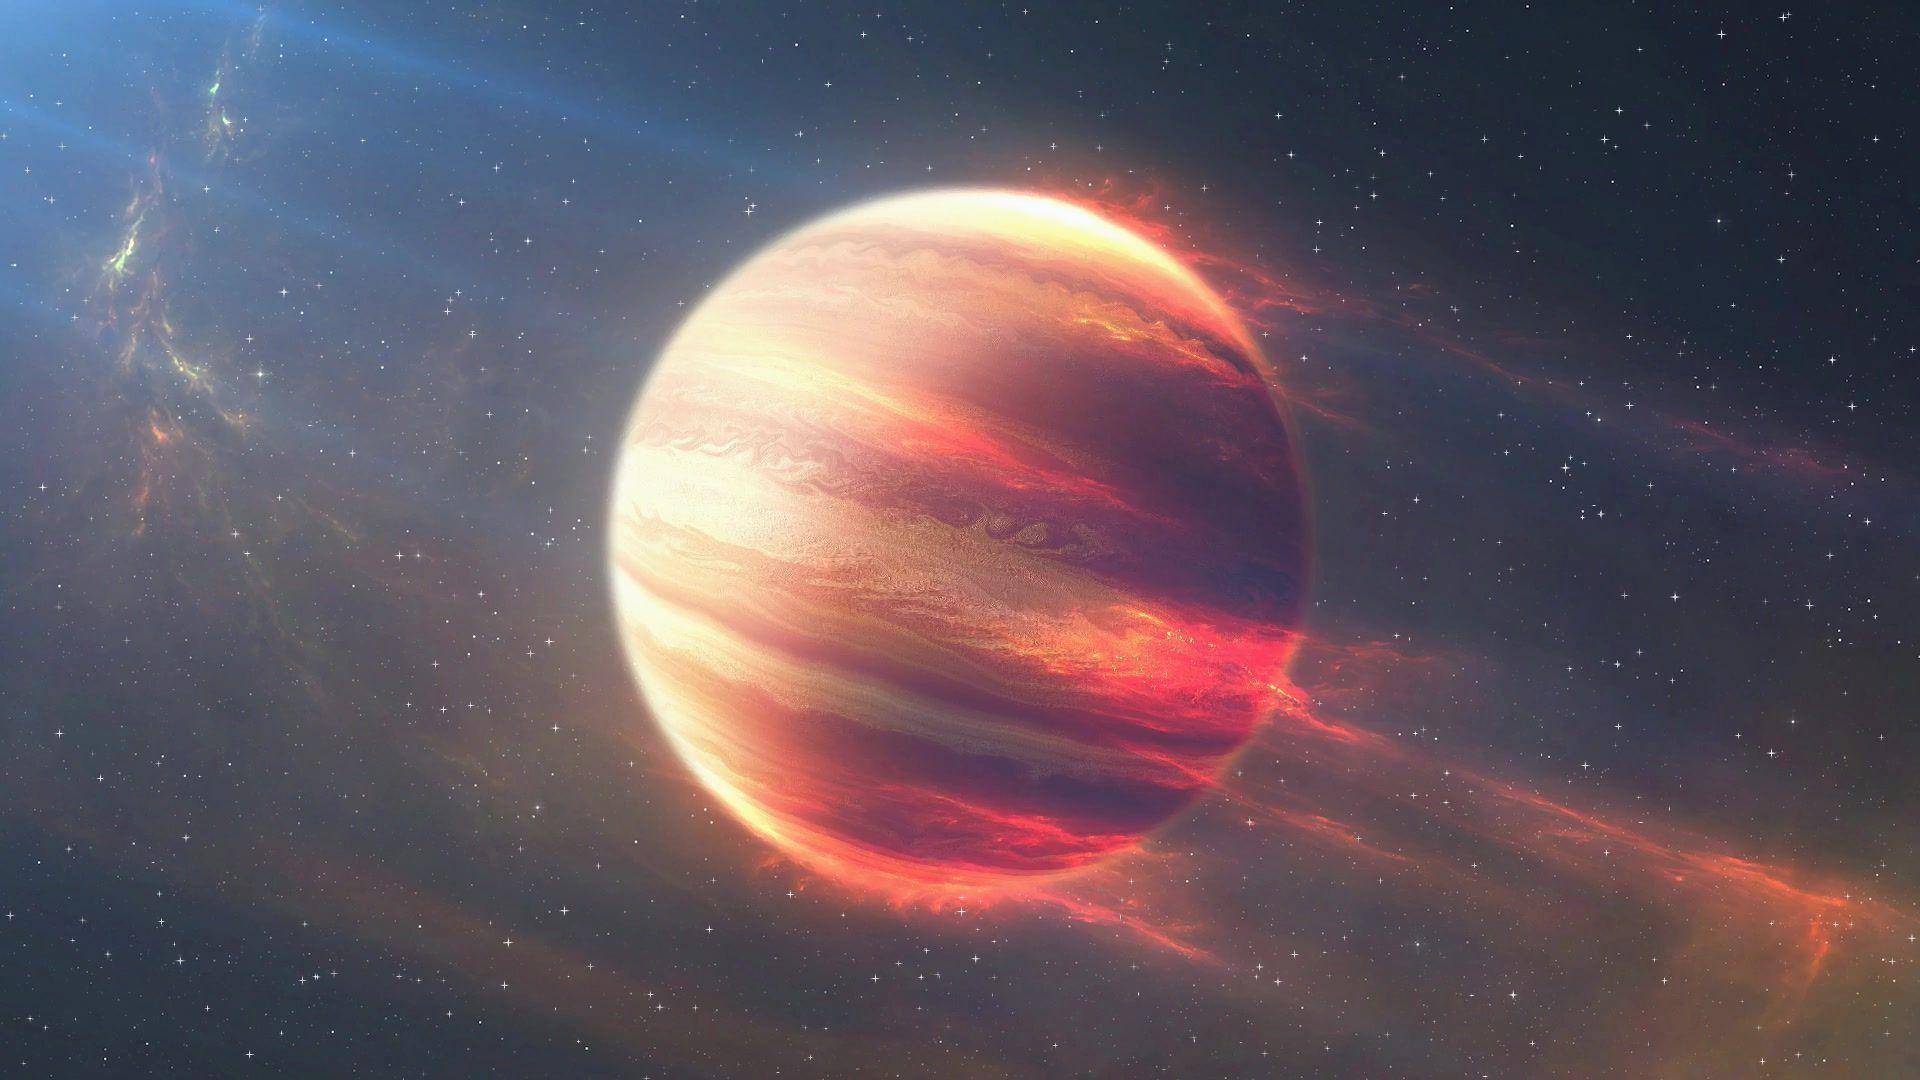 Starry Planet Live Wallpaper Hd Desktophut Rpg